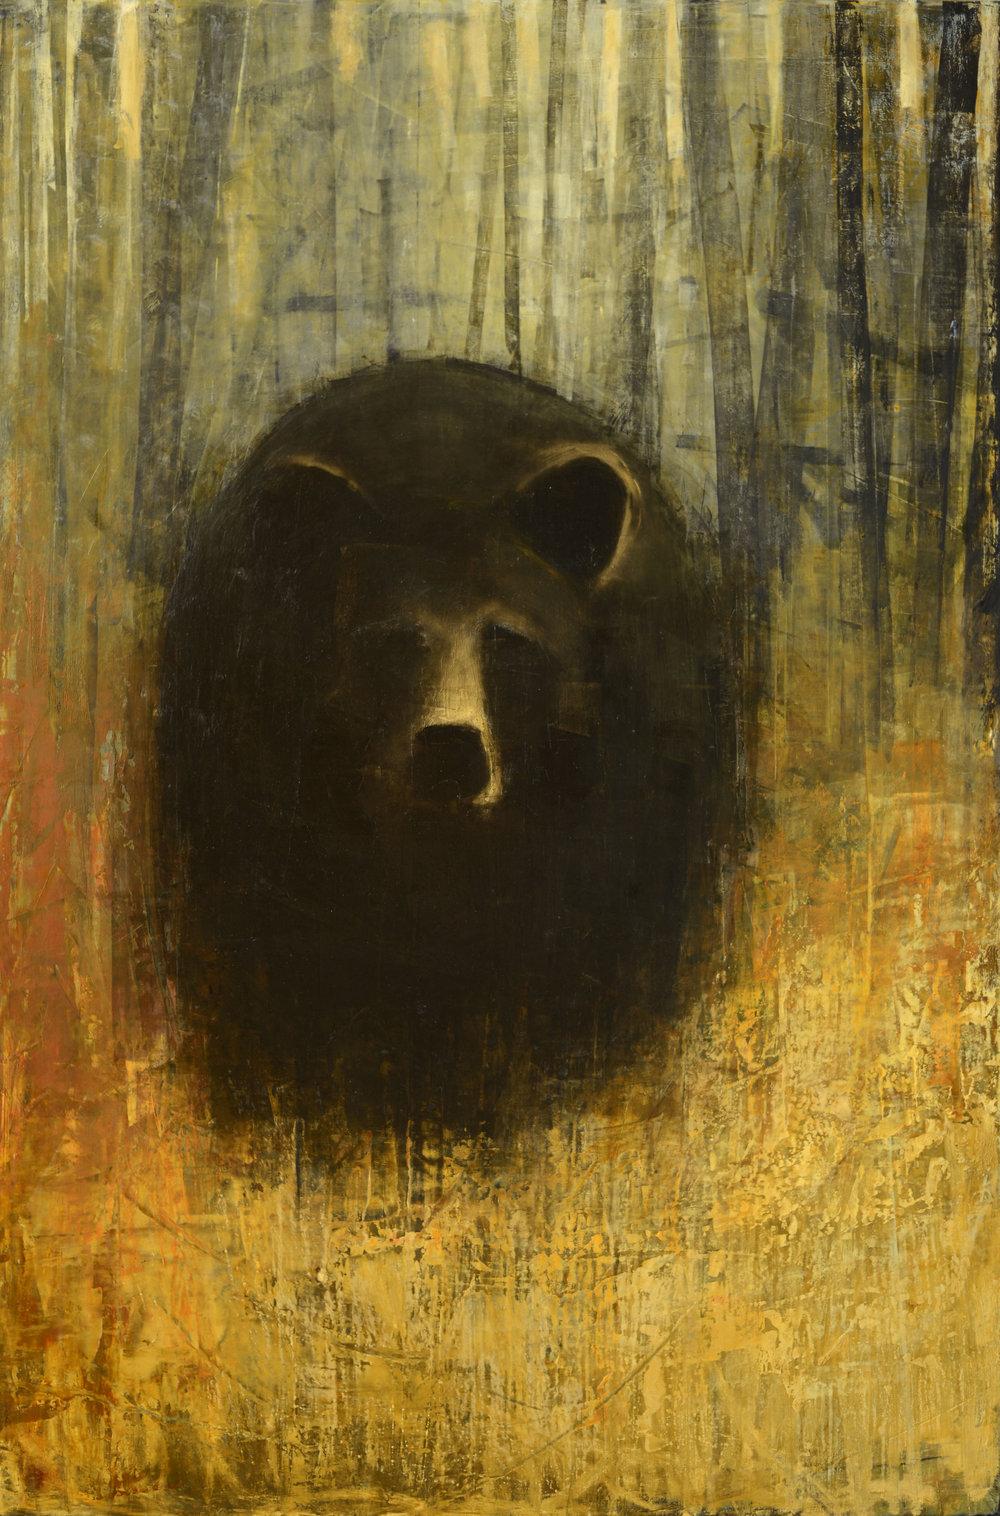 Black+Bear+(Golden+Field)_60x40.jpg